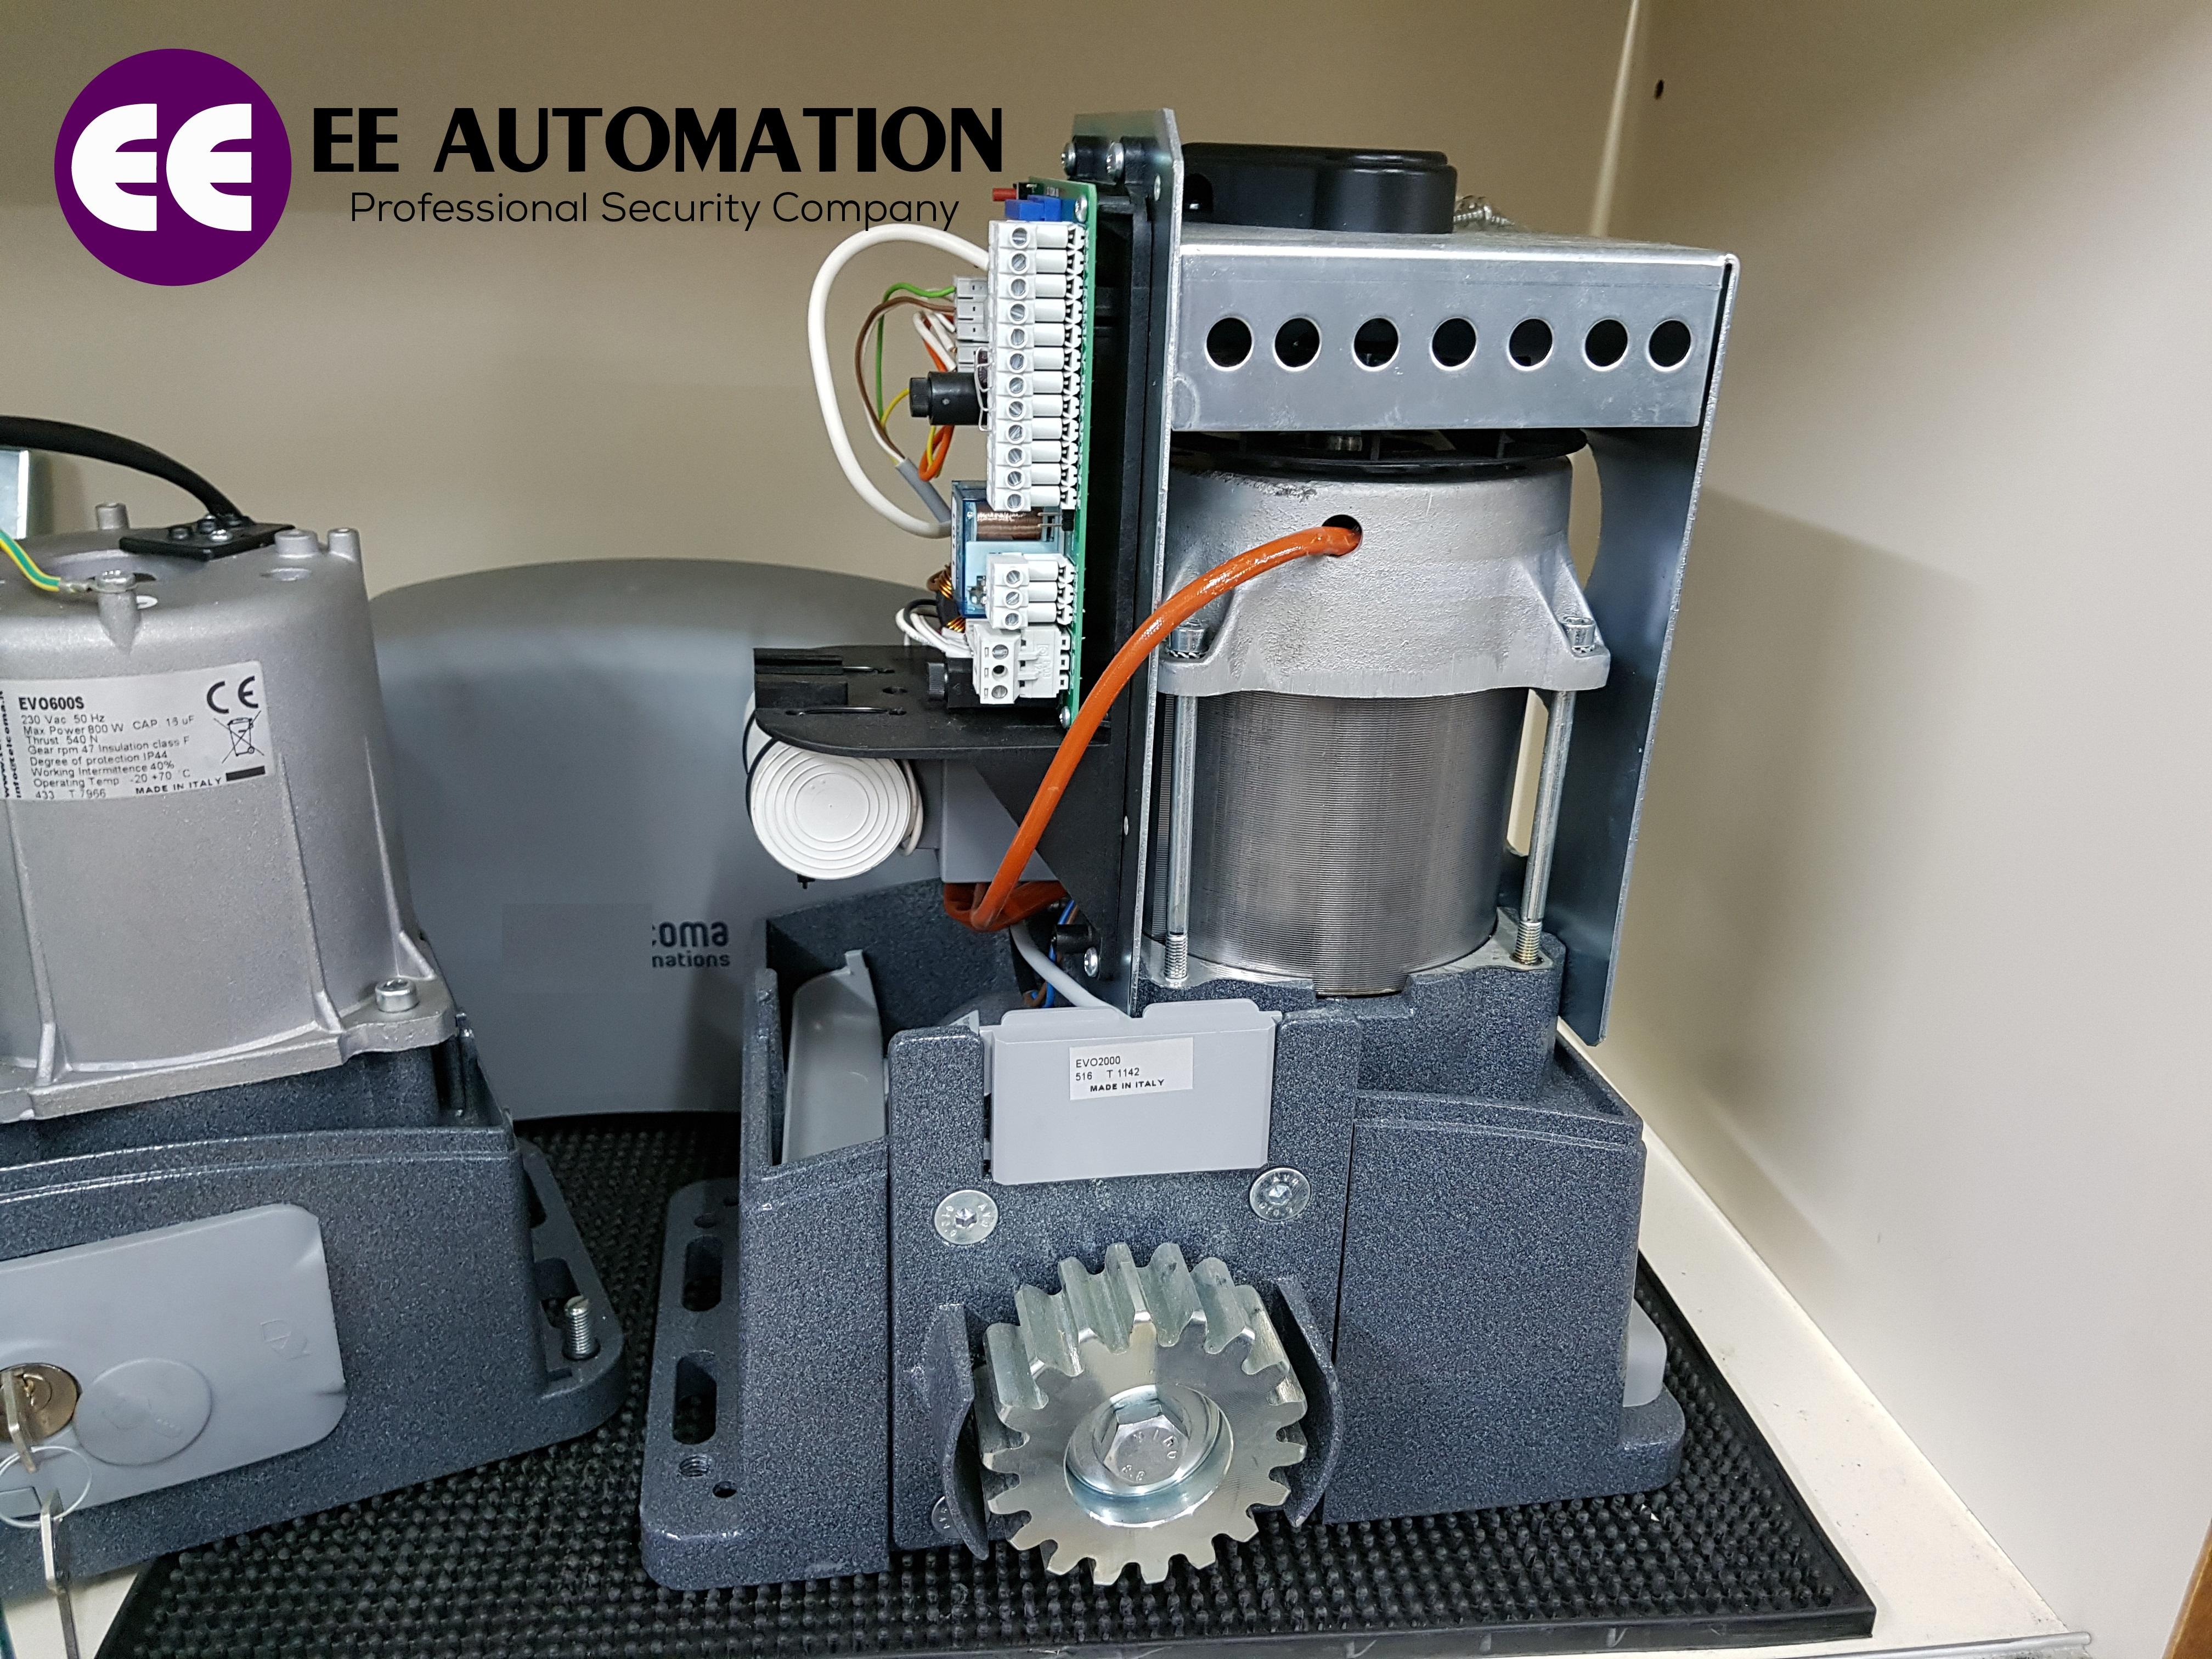 Italian Autogate Systems Eeautomation